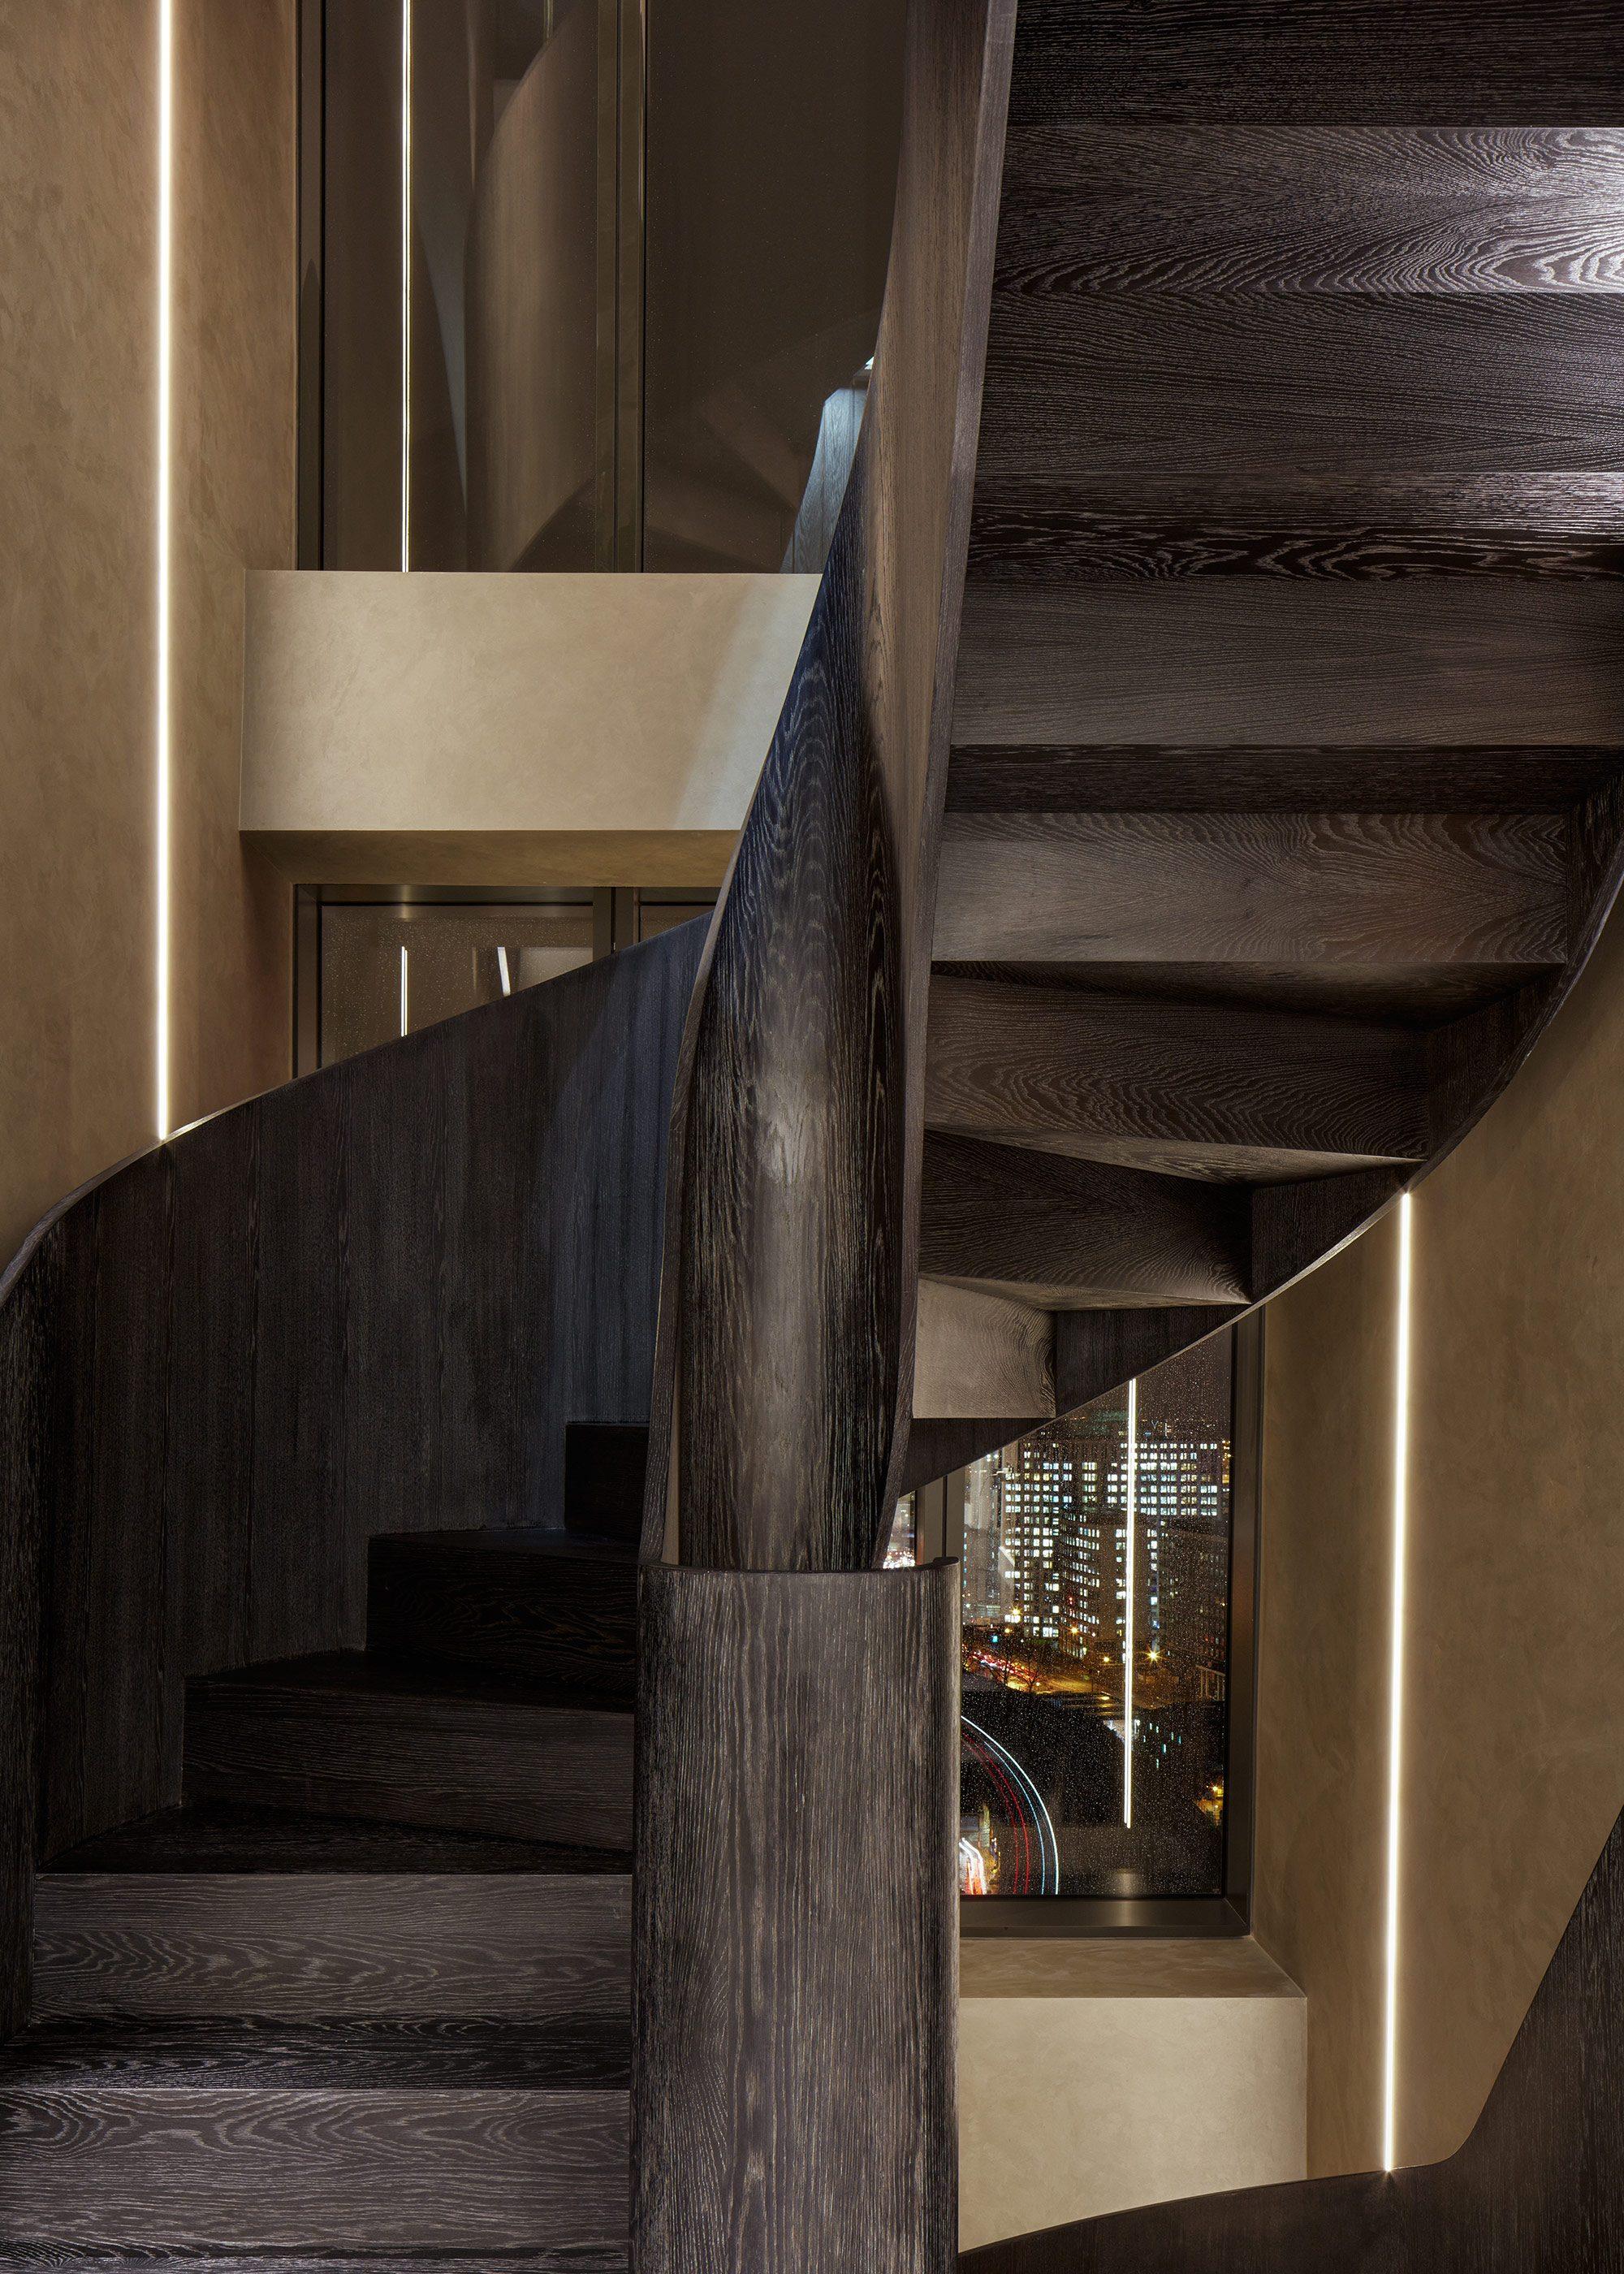 Honky Interior Design Parliament House London Stair Detail 2